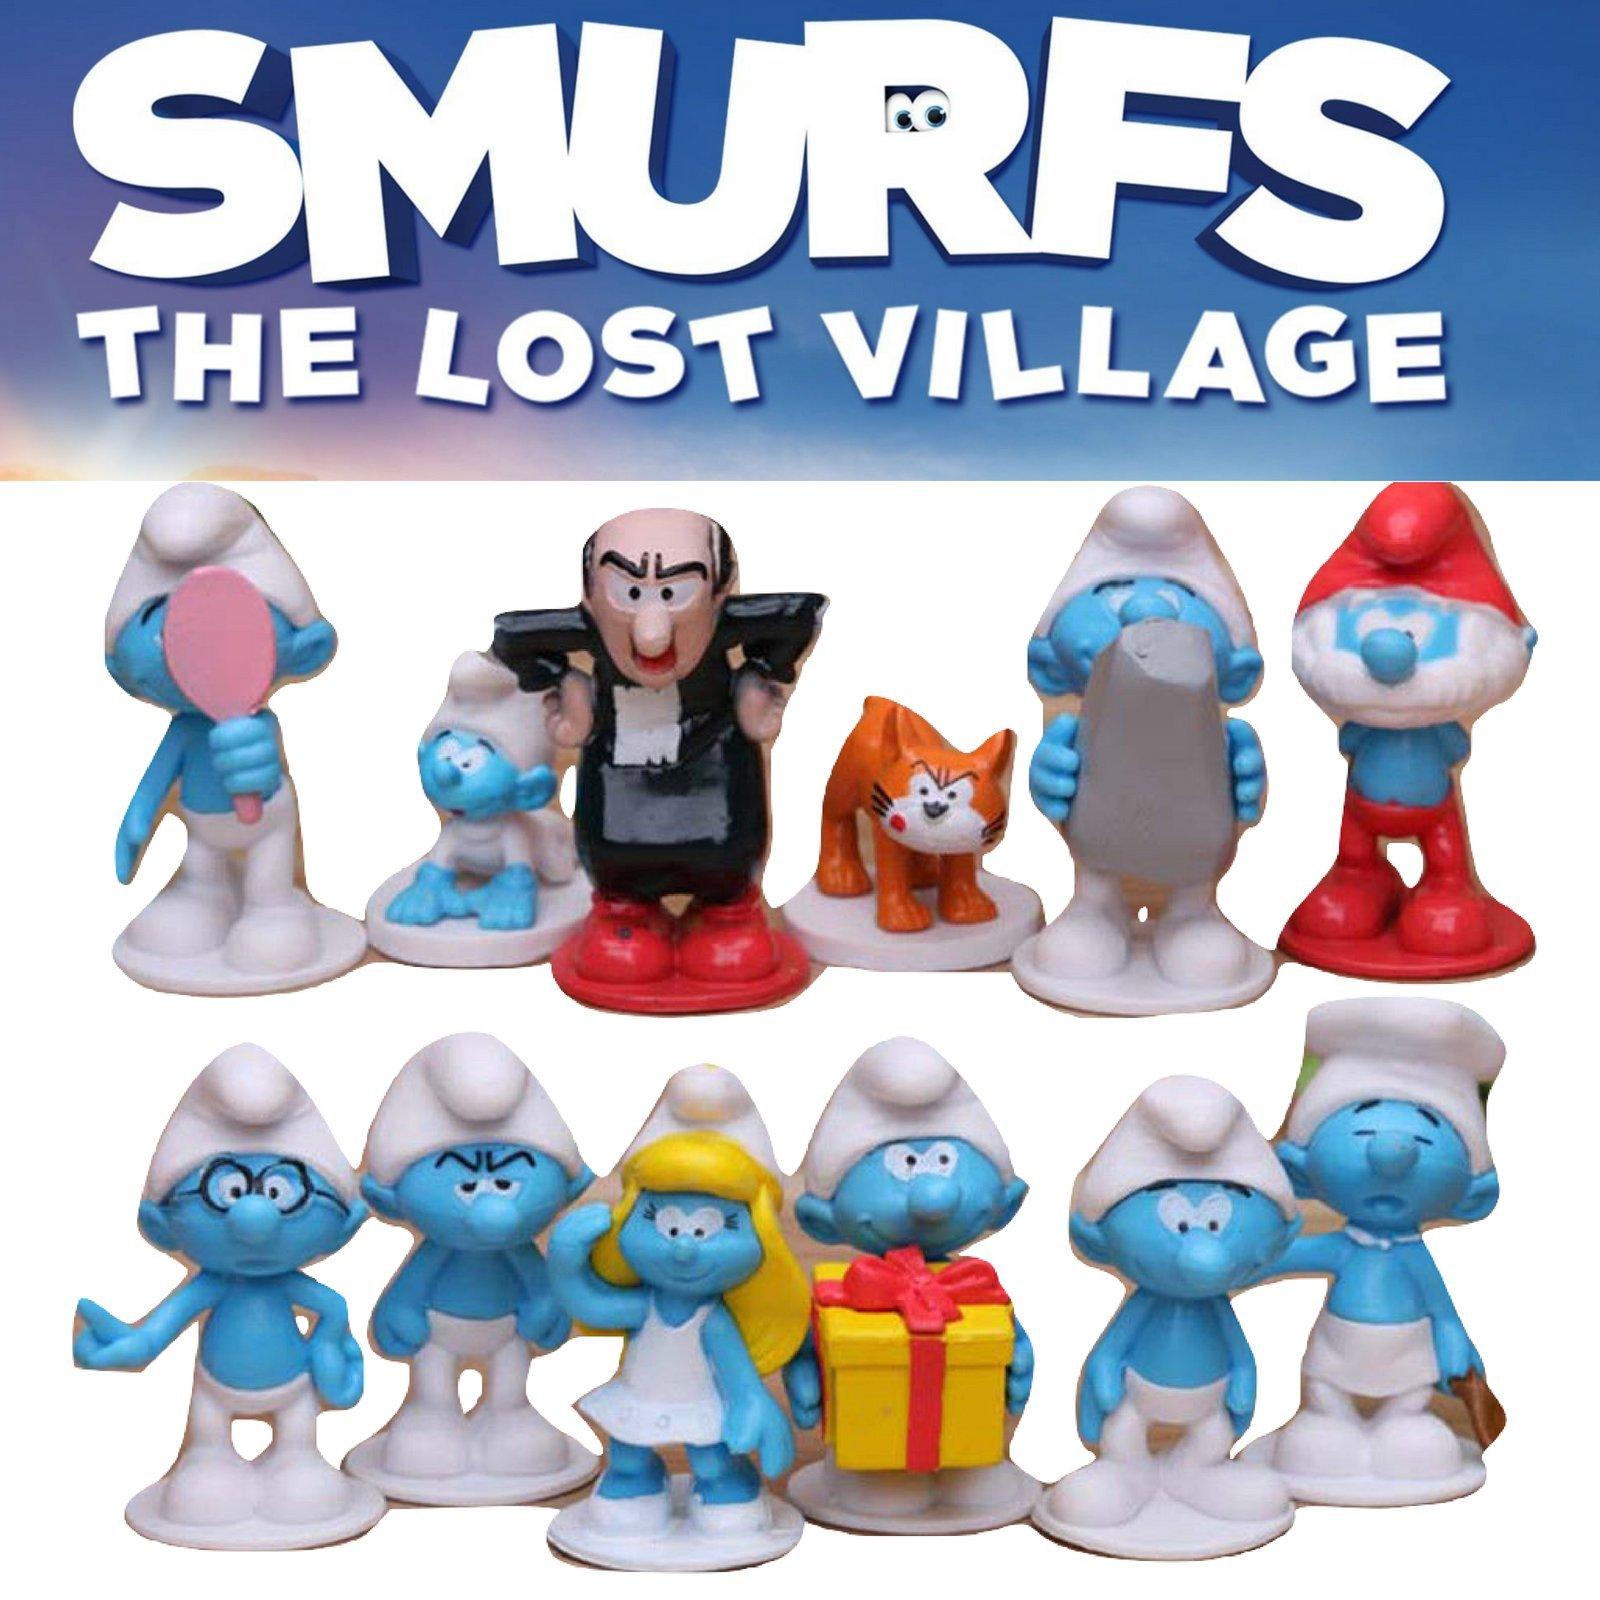 Smurfs The Lost Village Cake Topper | 12 Figure Set | By ToysoutletUSA by ToysoutletUSA